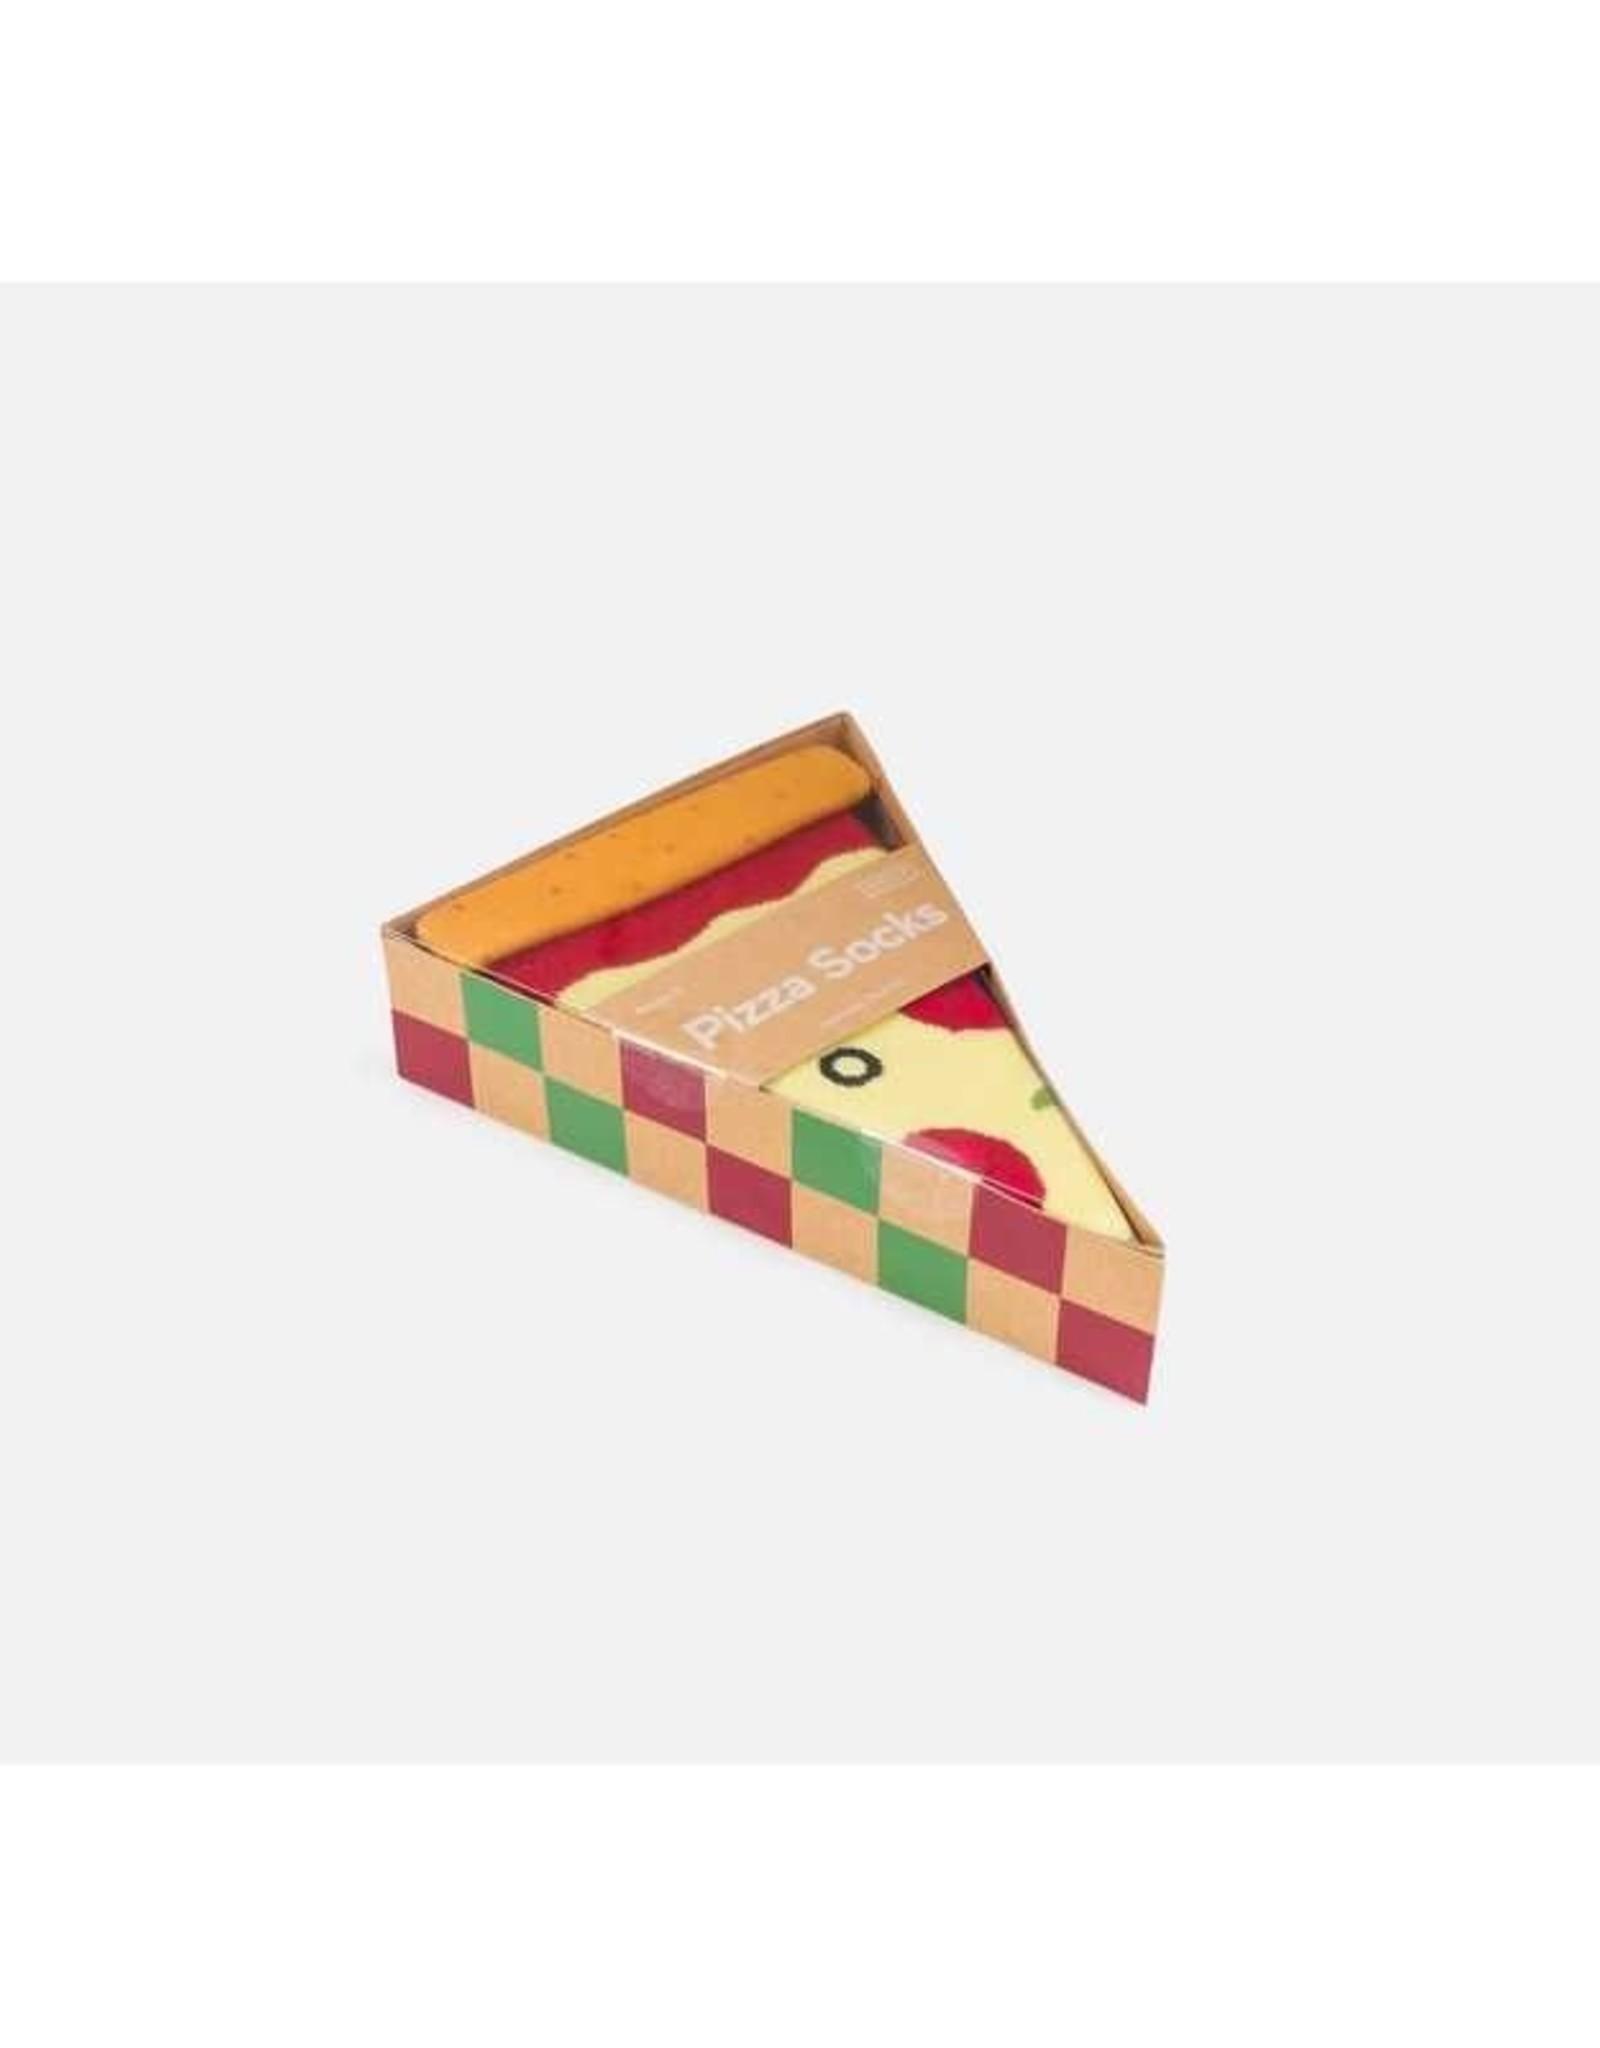 DOIY DOIY-Pizza socks